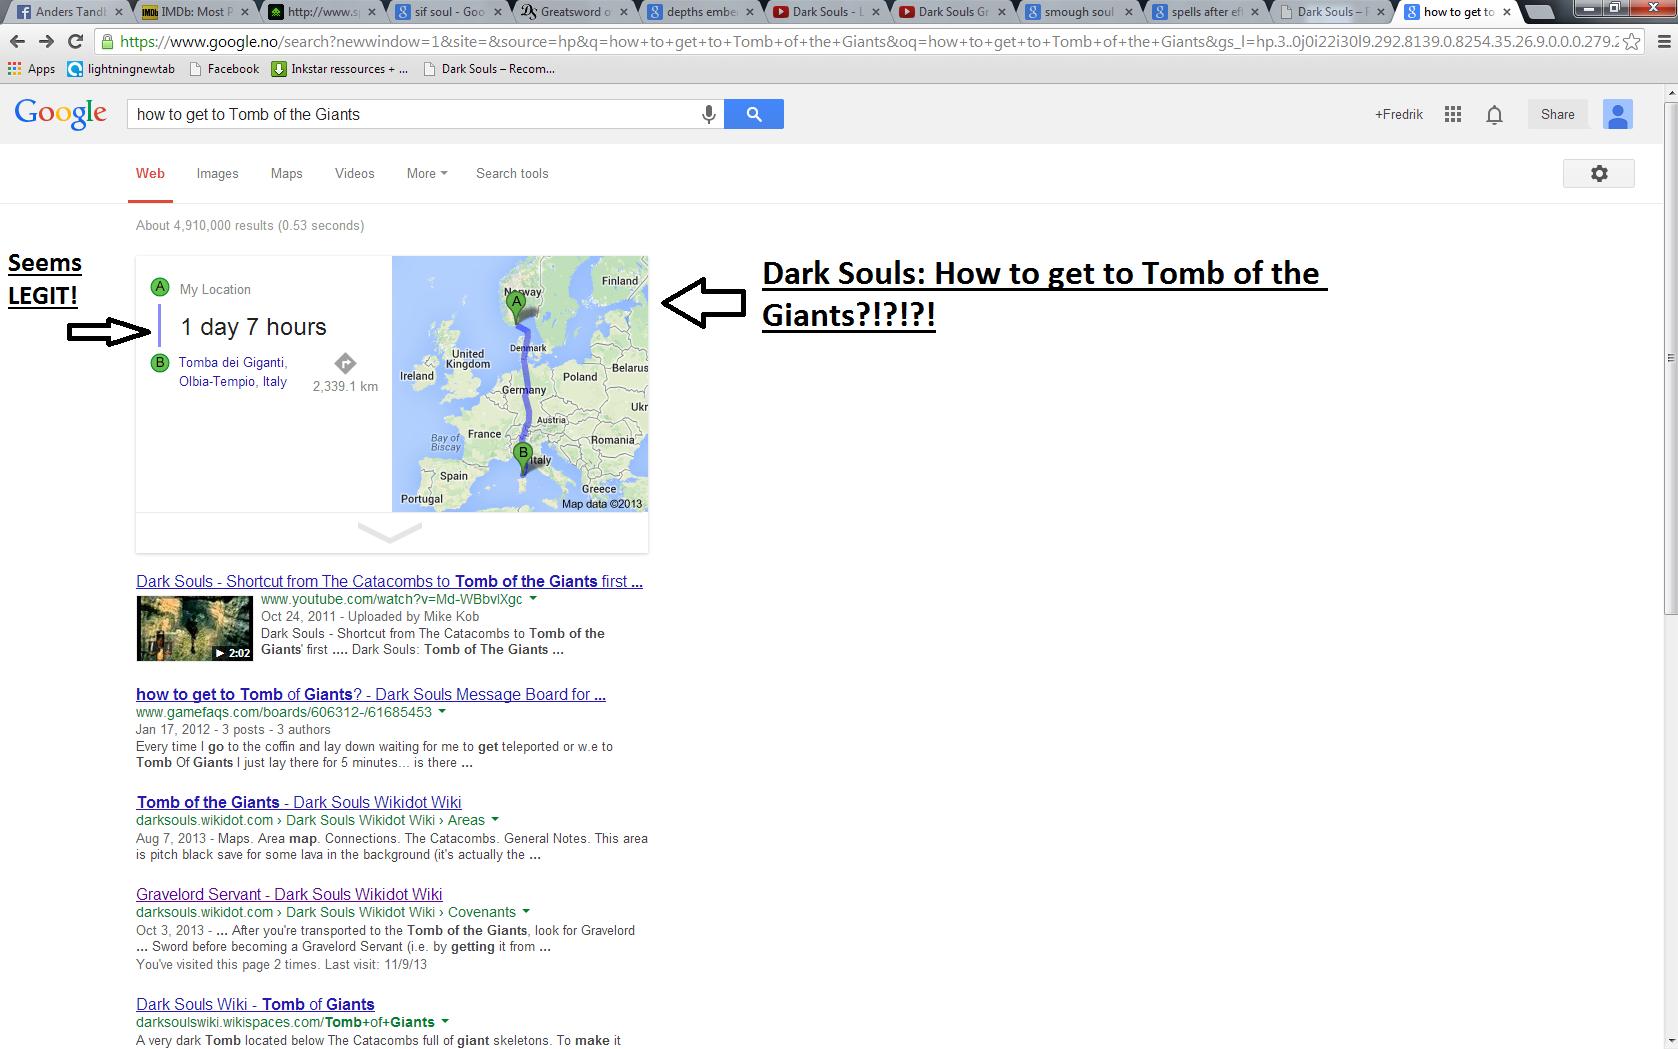 "Random google directions?. Seems legit.... iii Apps E] Facebook "" , E] Dark . Web Images Maps Videos More _ Se arch tools About 4, 910, 000 results (153 seconds dark souls dark souls funny Google fail"